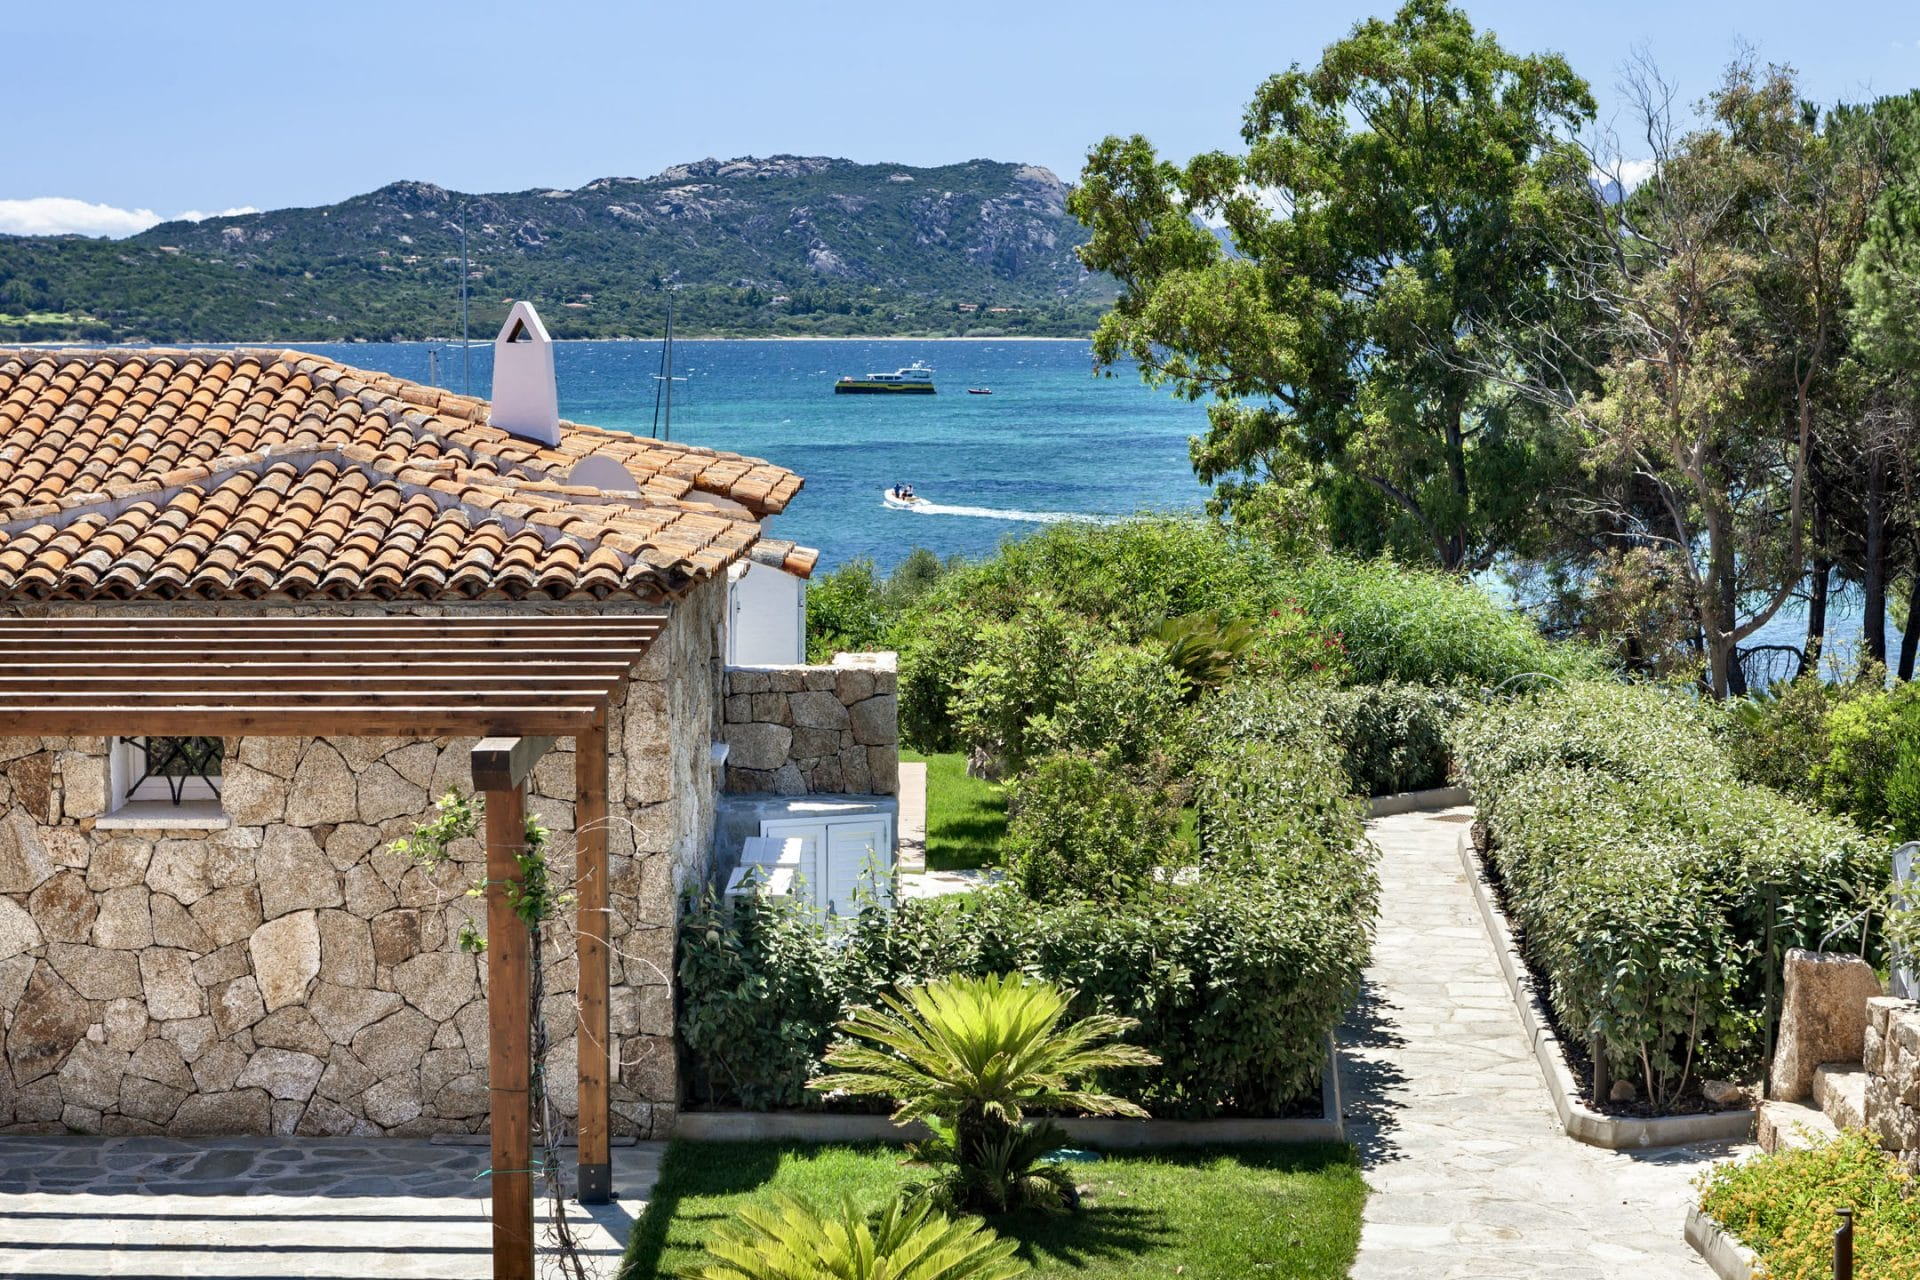 Seafront villa in Costa Smeralda